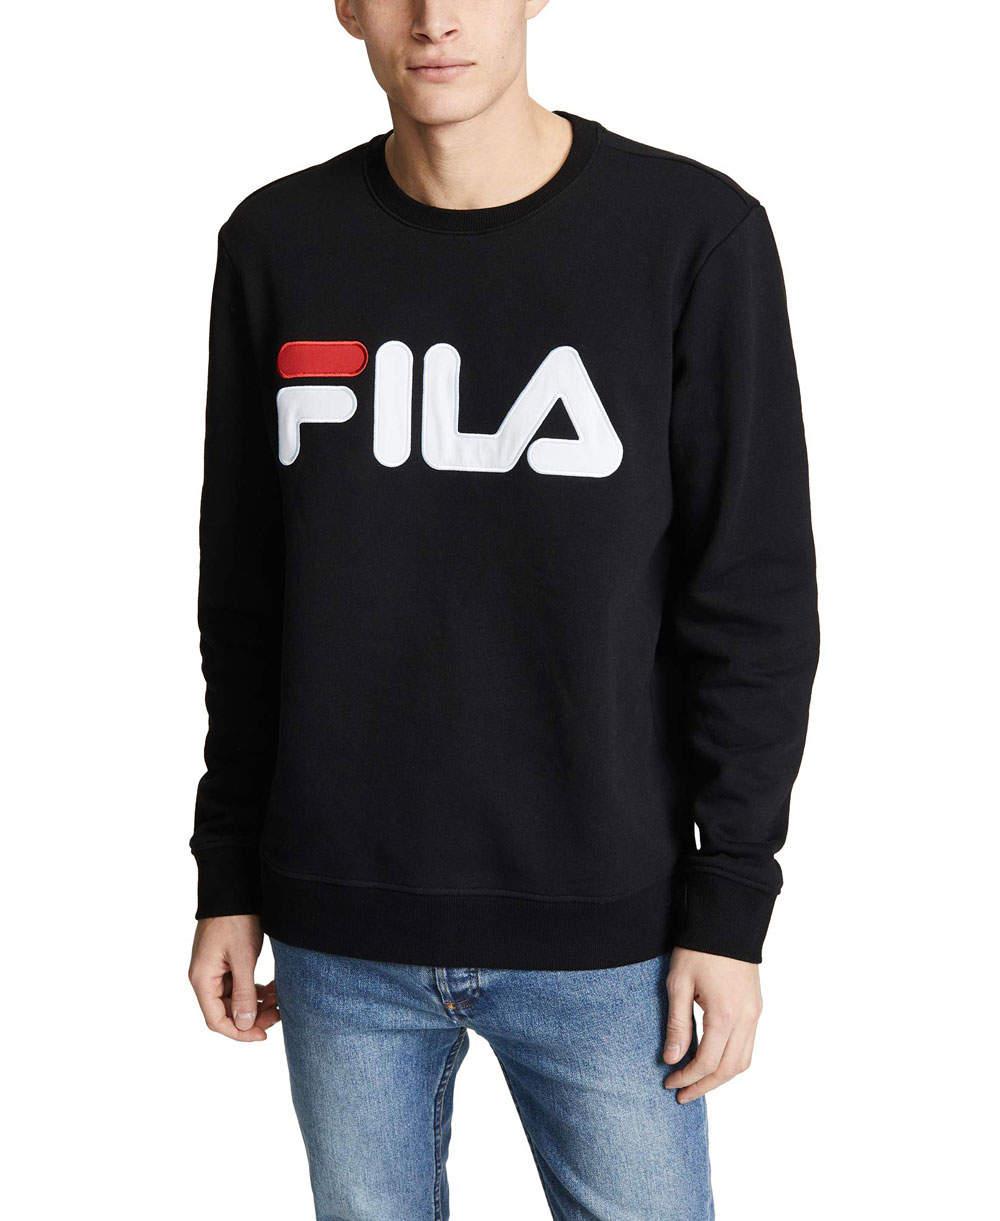 Regola Sweat-shirt Homme Black